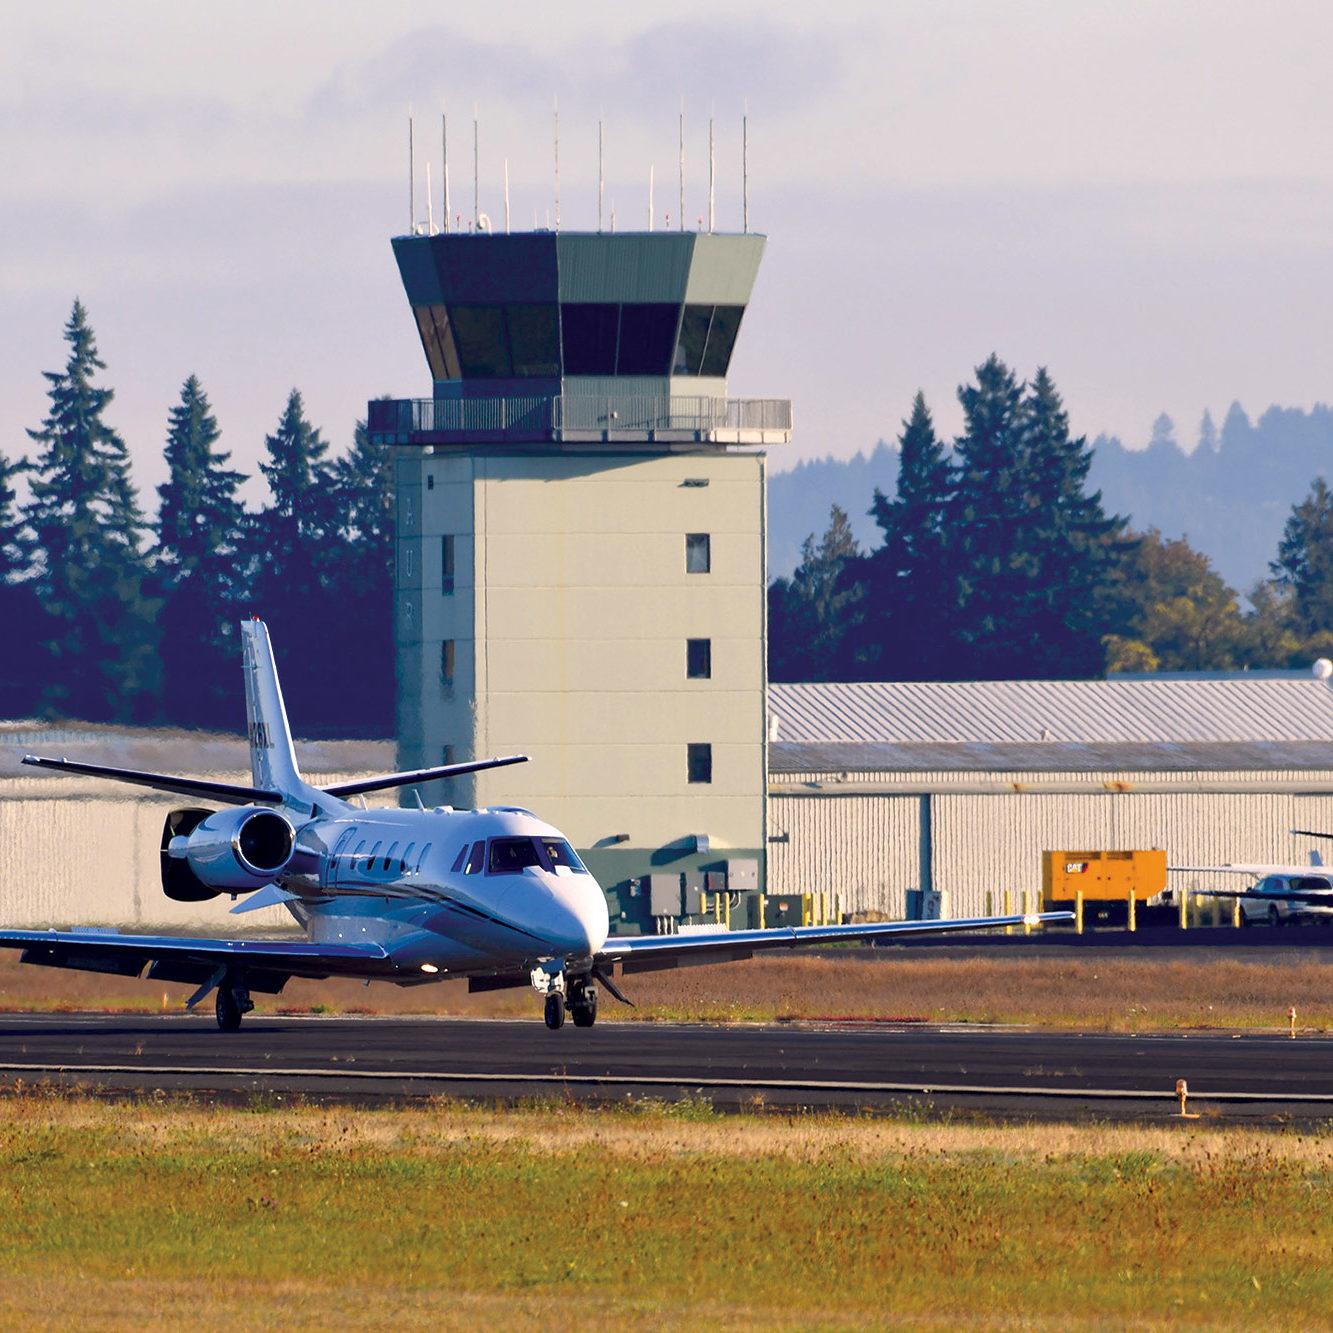 aurora-airport-tower-and-runway-plane